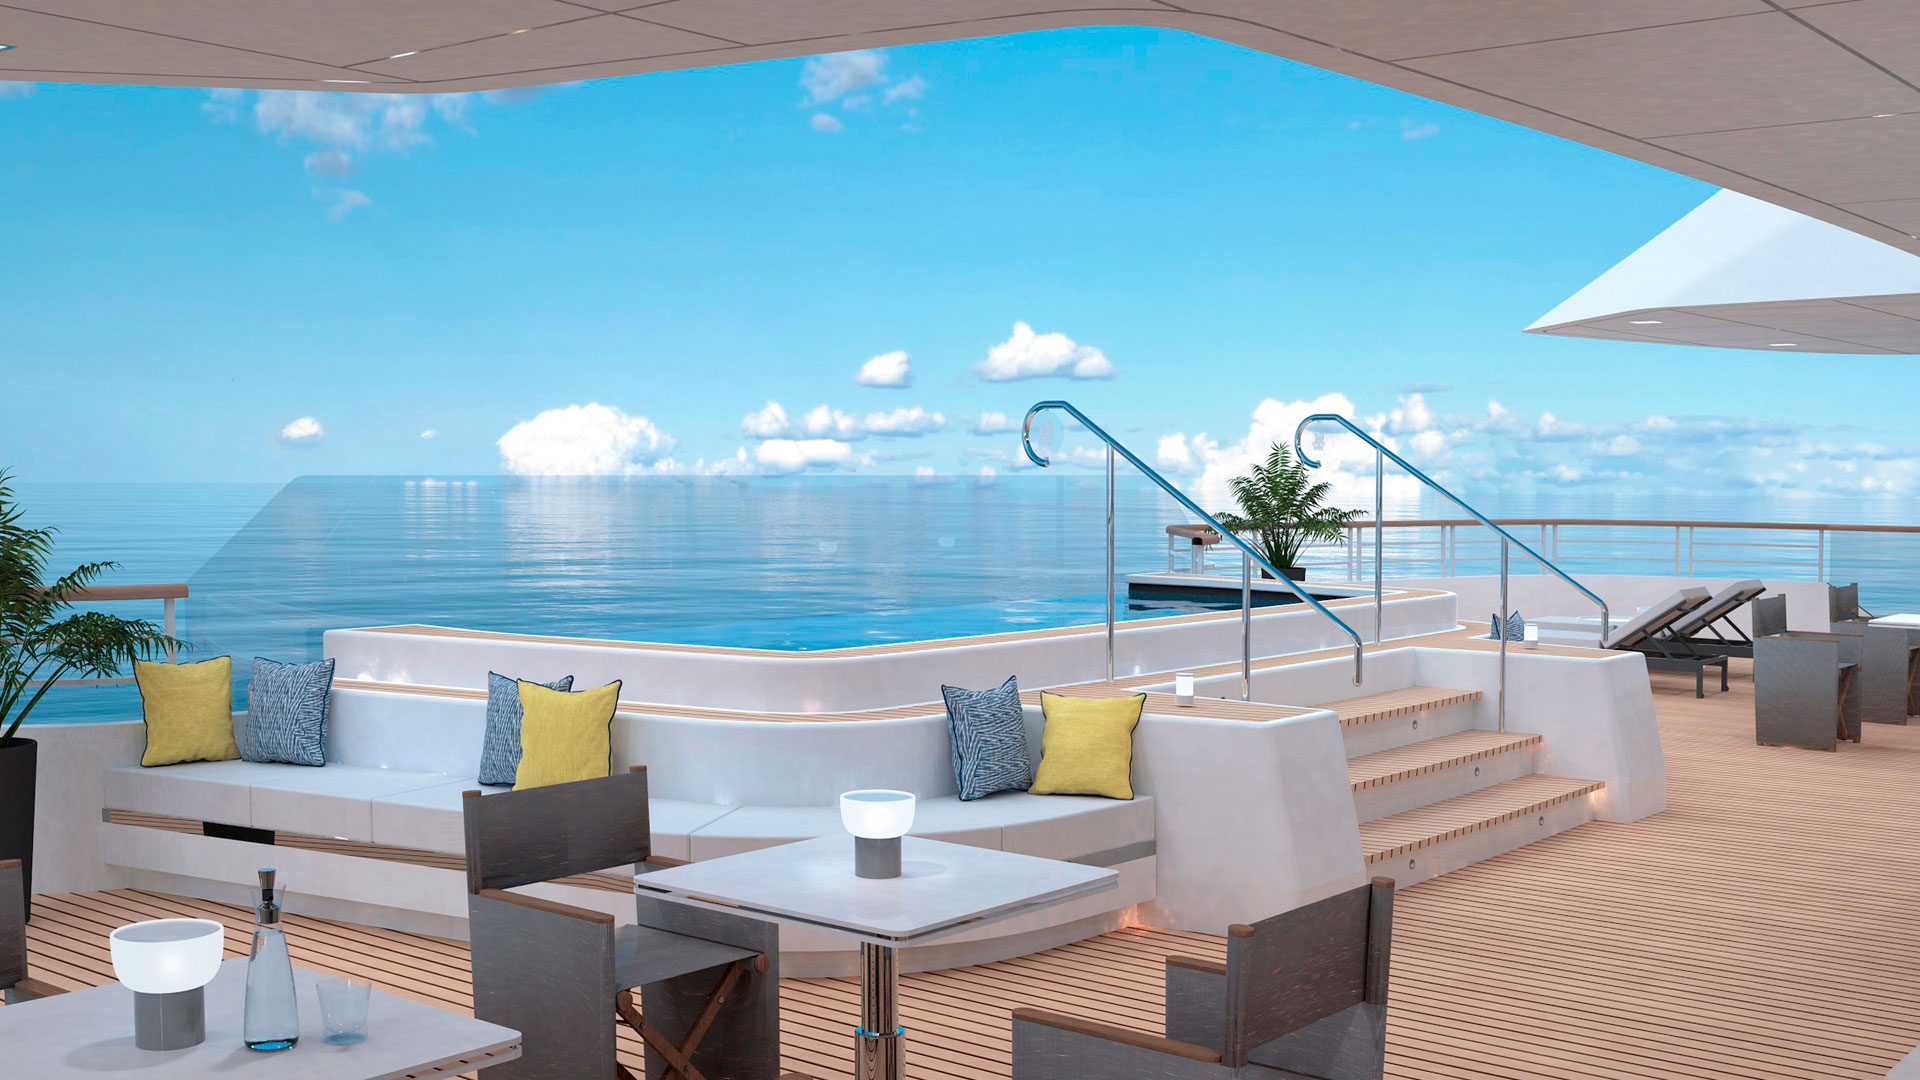 Imagen del yate Evrima de Ritz Carlton Yacht